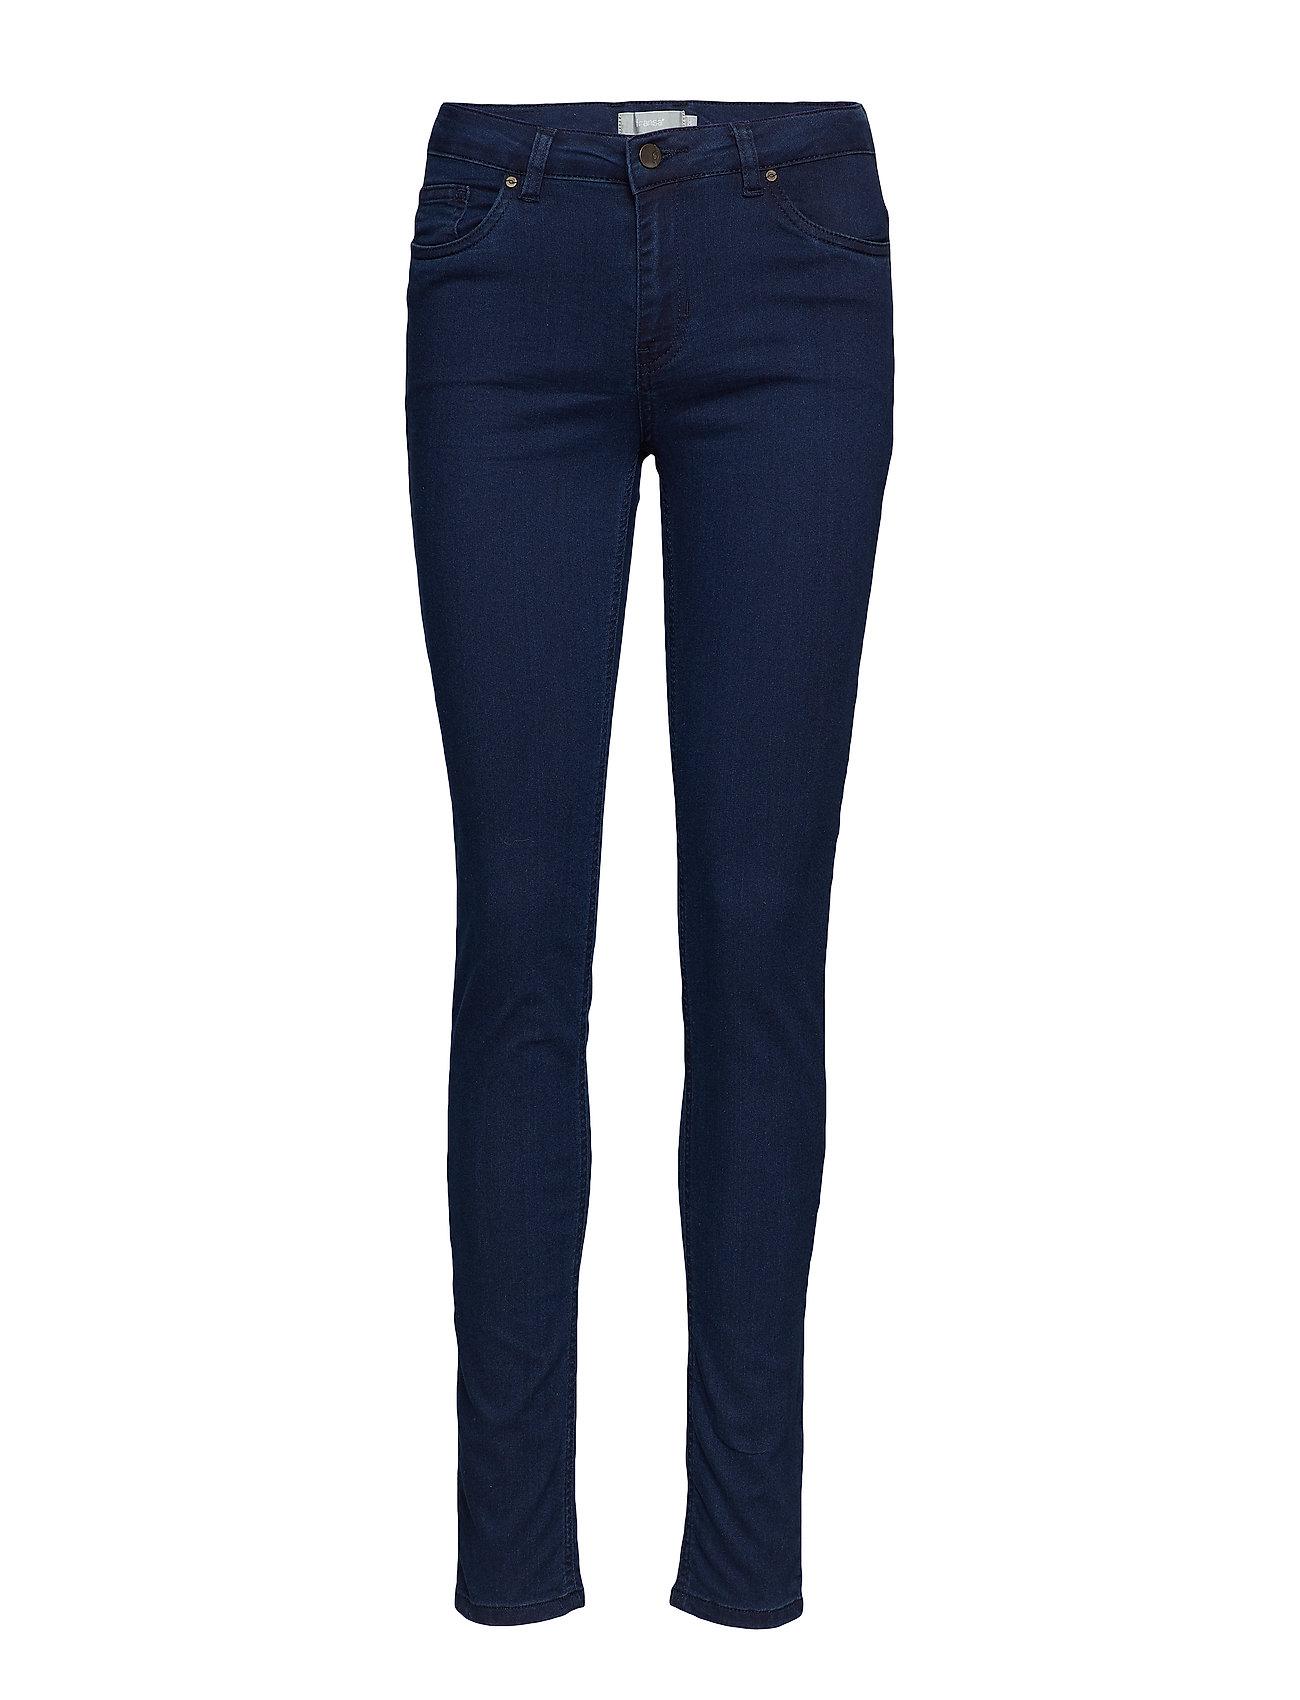 Fransa FRZAPOWER 1 Pants - GLOSSY BLUE DENIM